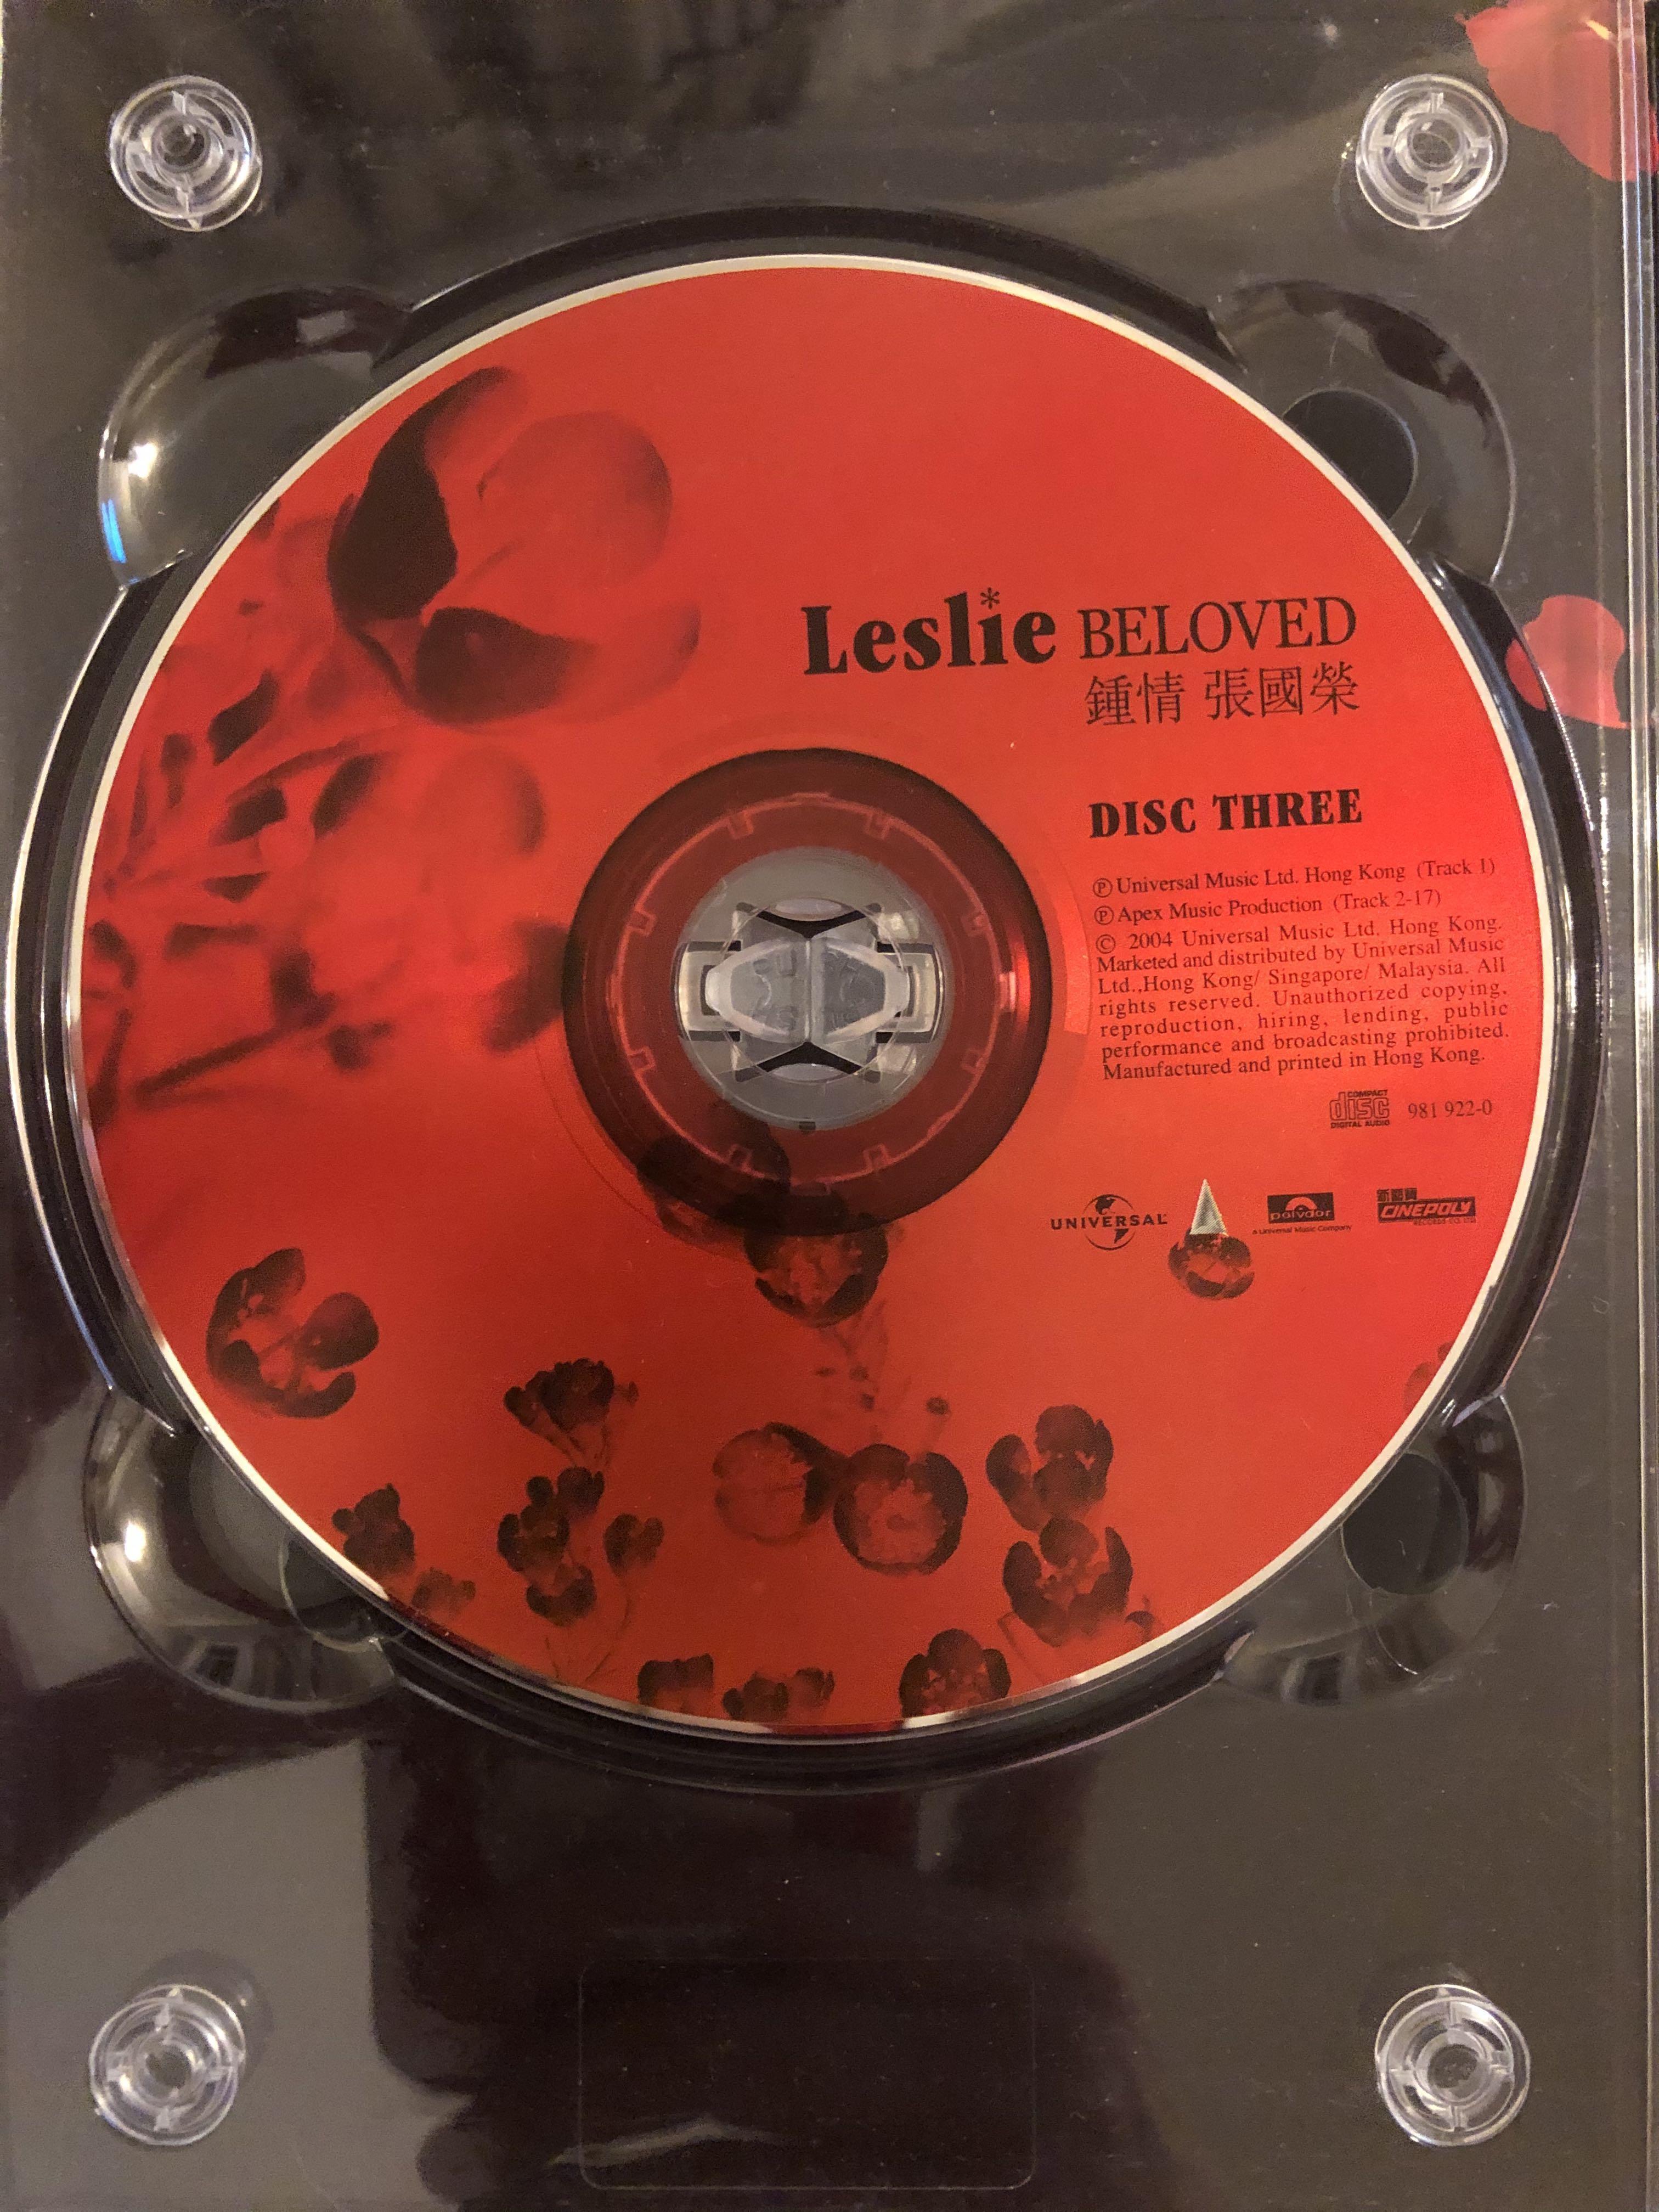 CD:張國榮 鍾情 Leslie Beloved (首批絨布版) (3CD)